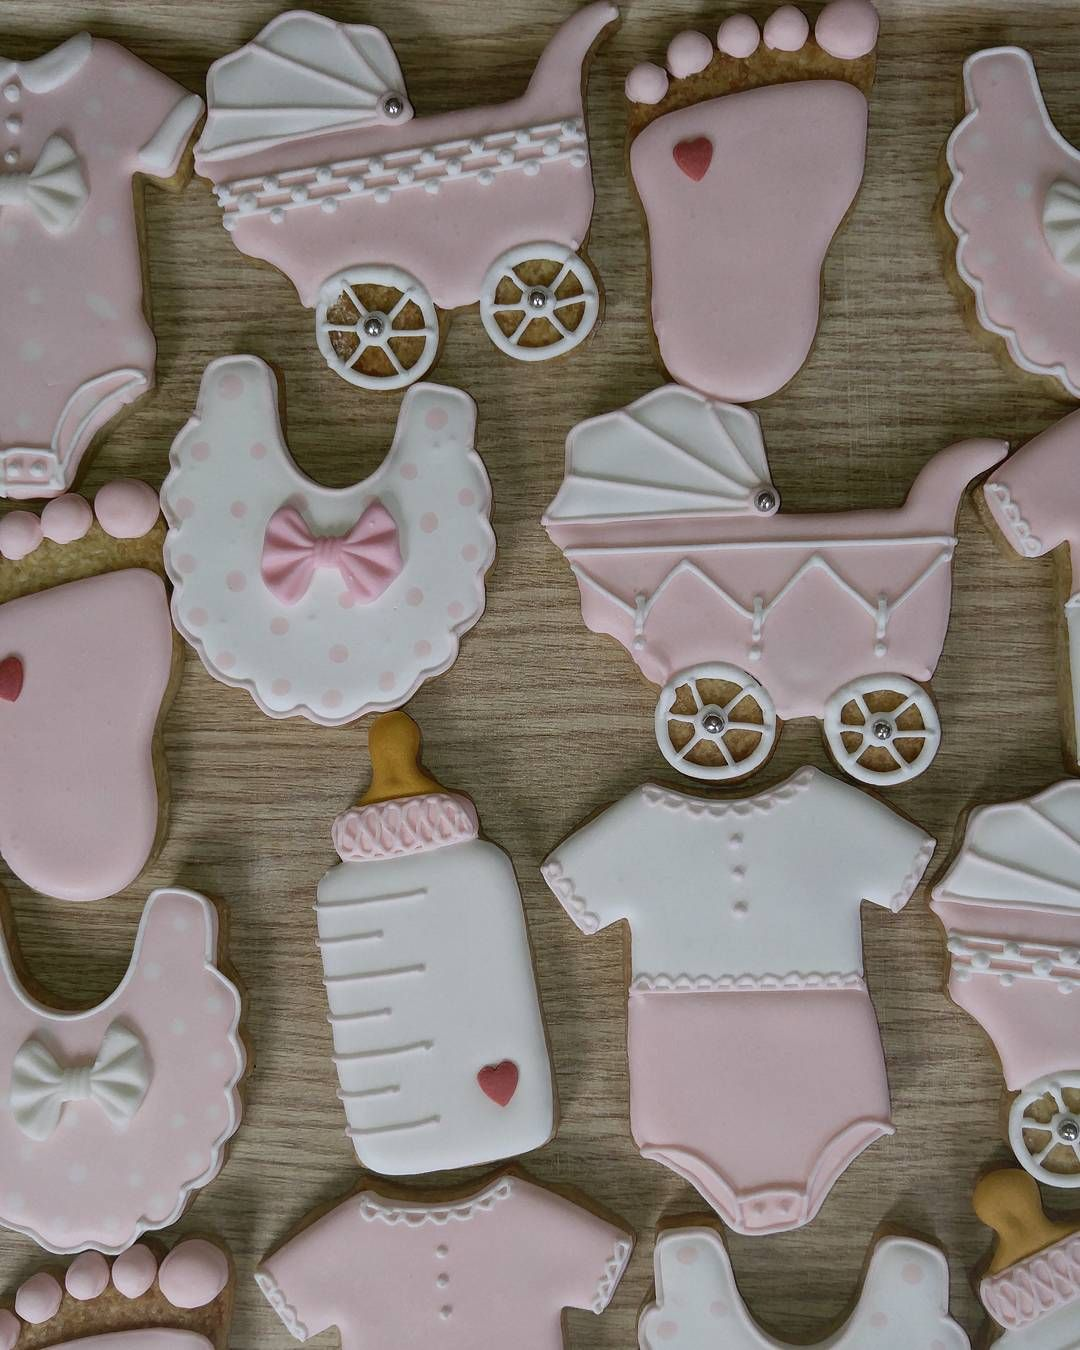 توزيعات مواليد بنات Polymer Clay Crafts Baby Shower Prizes Clay Crafts